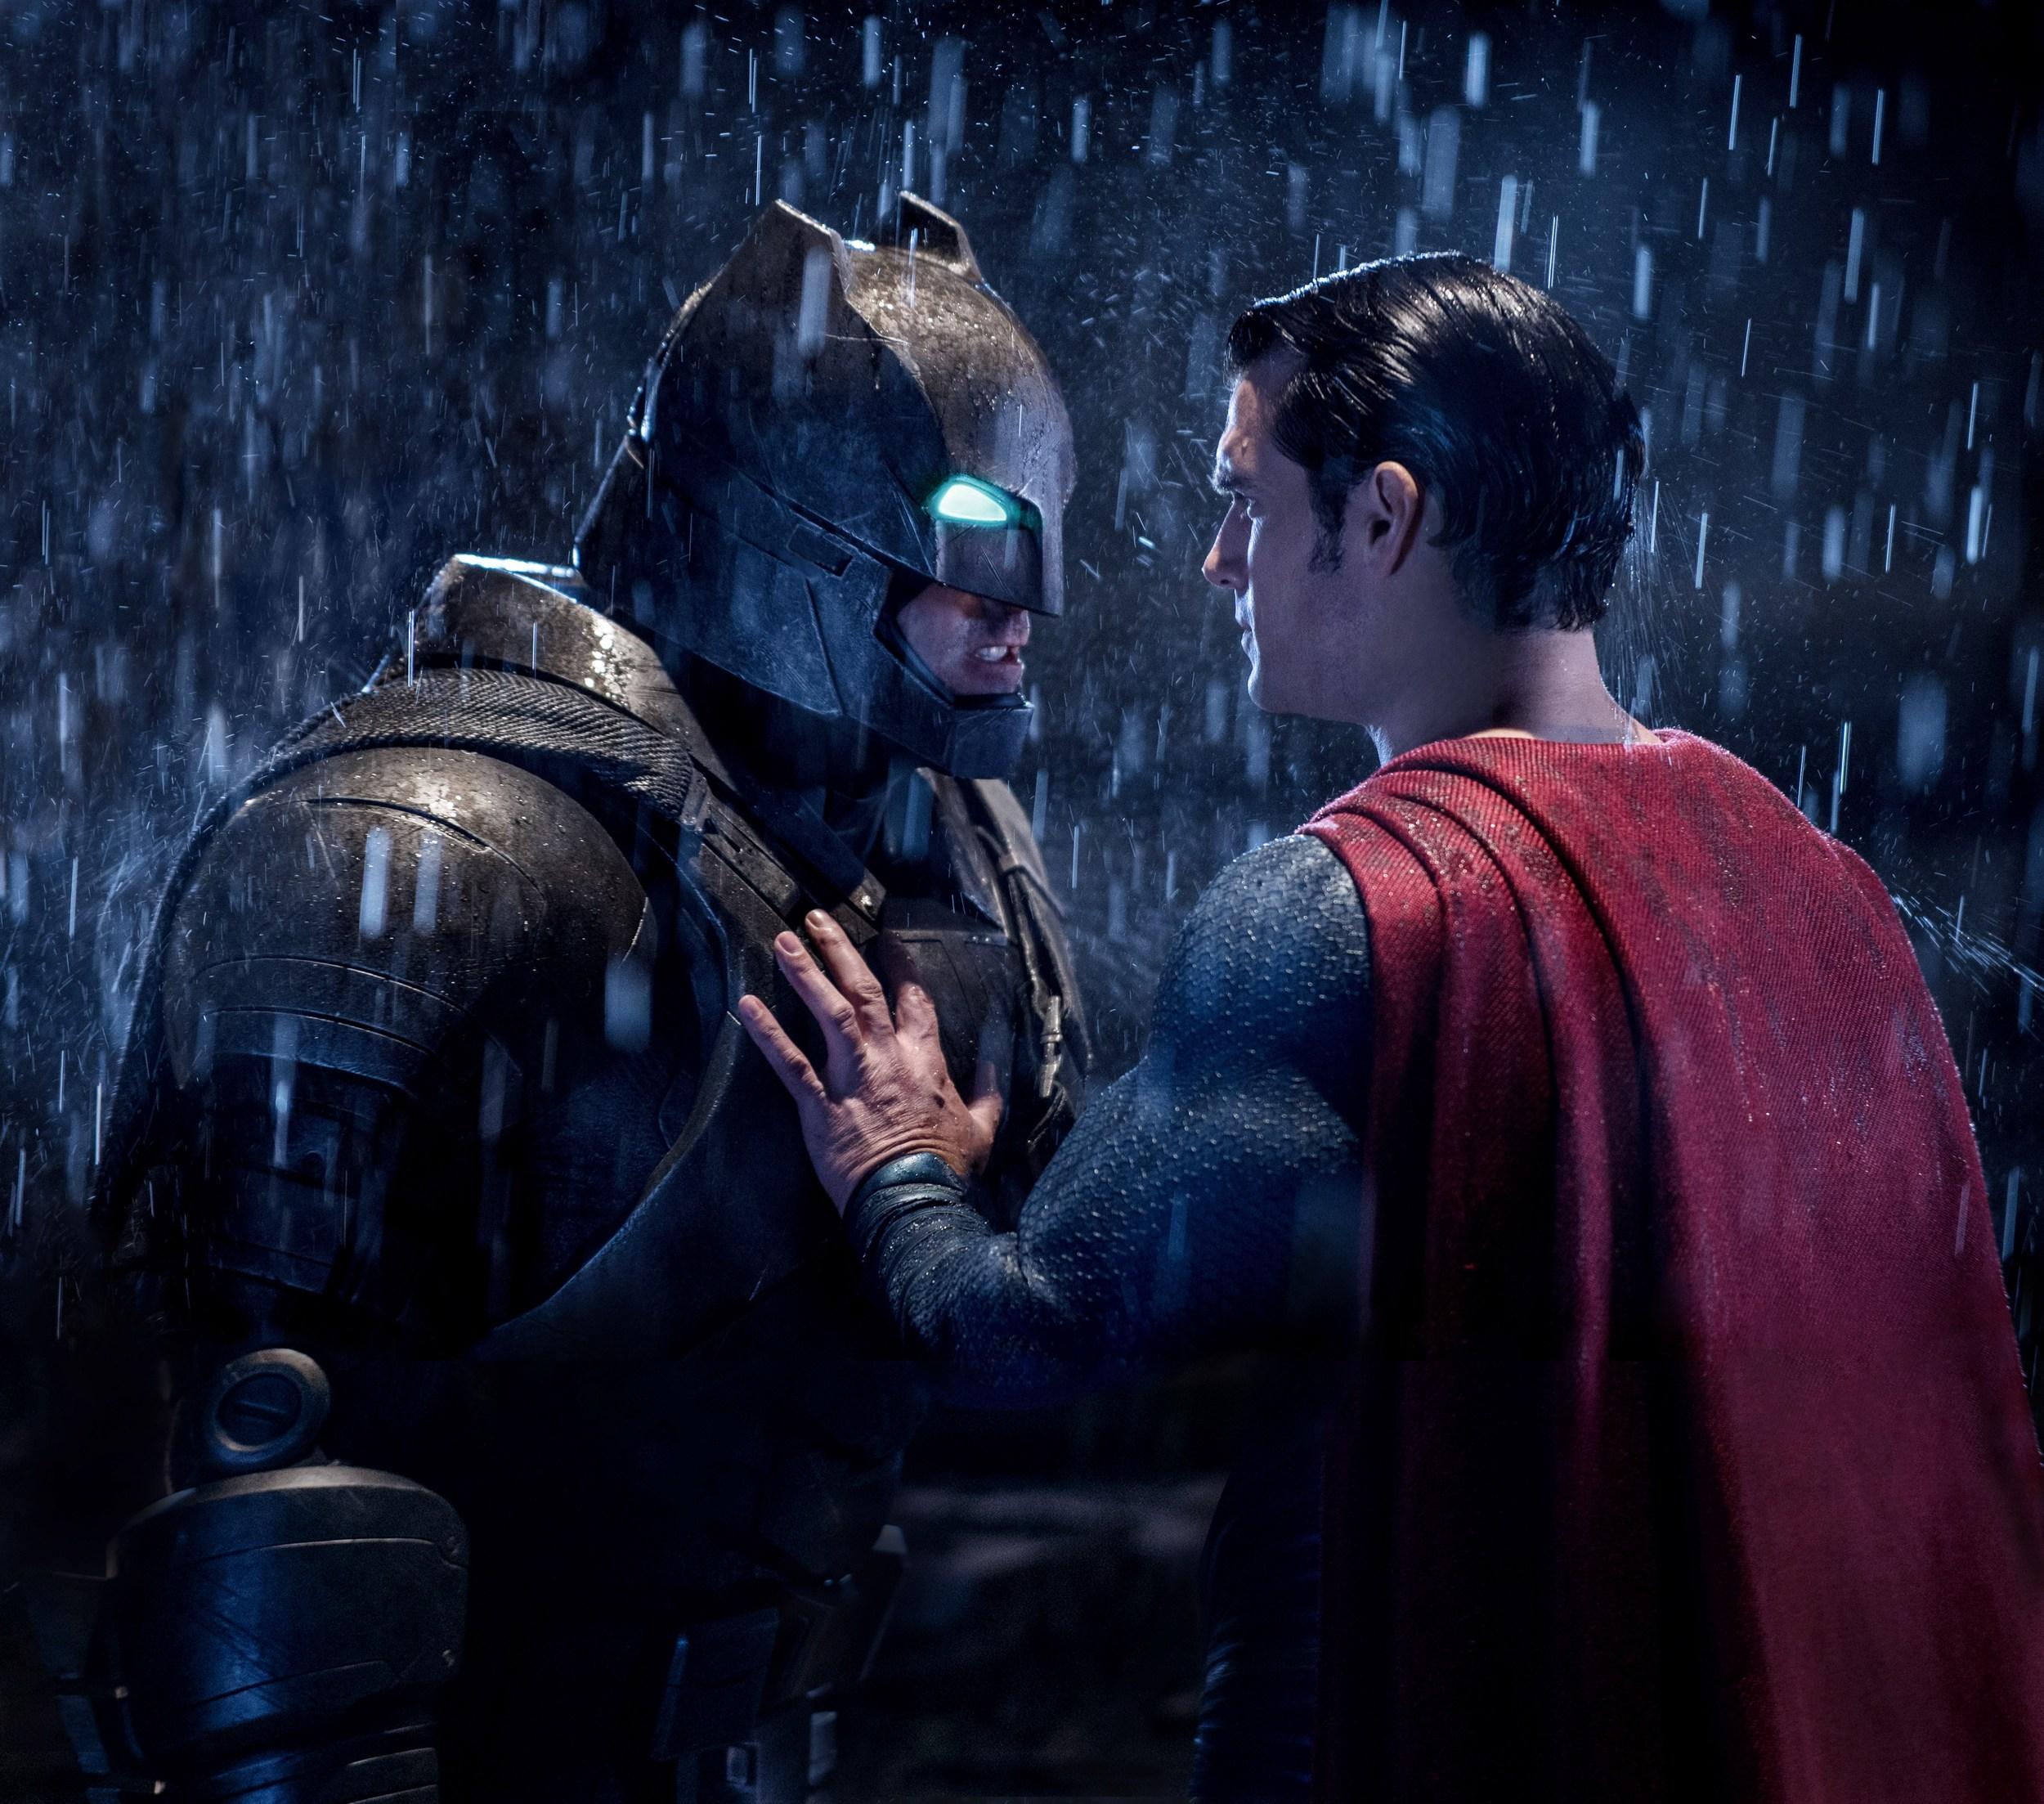 Ben Affleck and Henry Cavill star in director Zack Snyder's  Batman v. Superman: Dawn of Justice